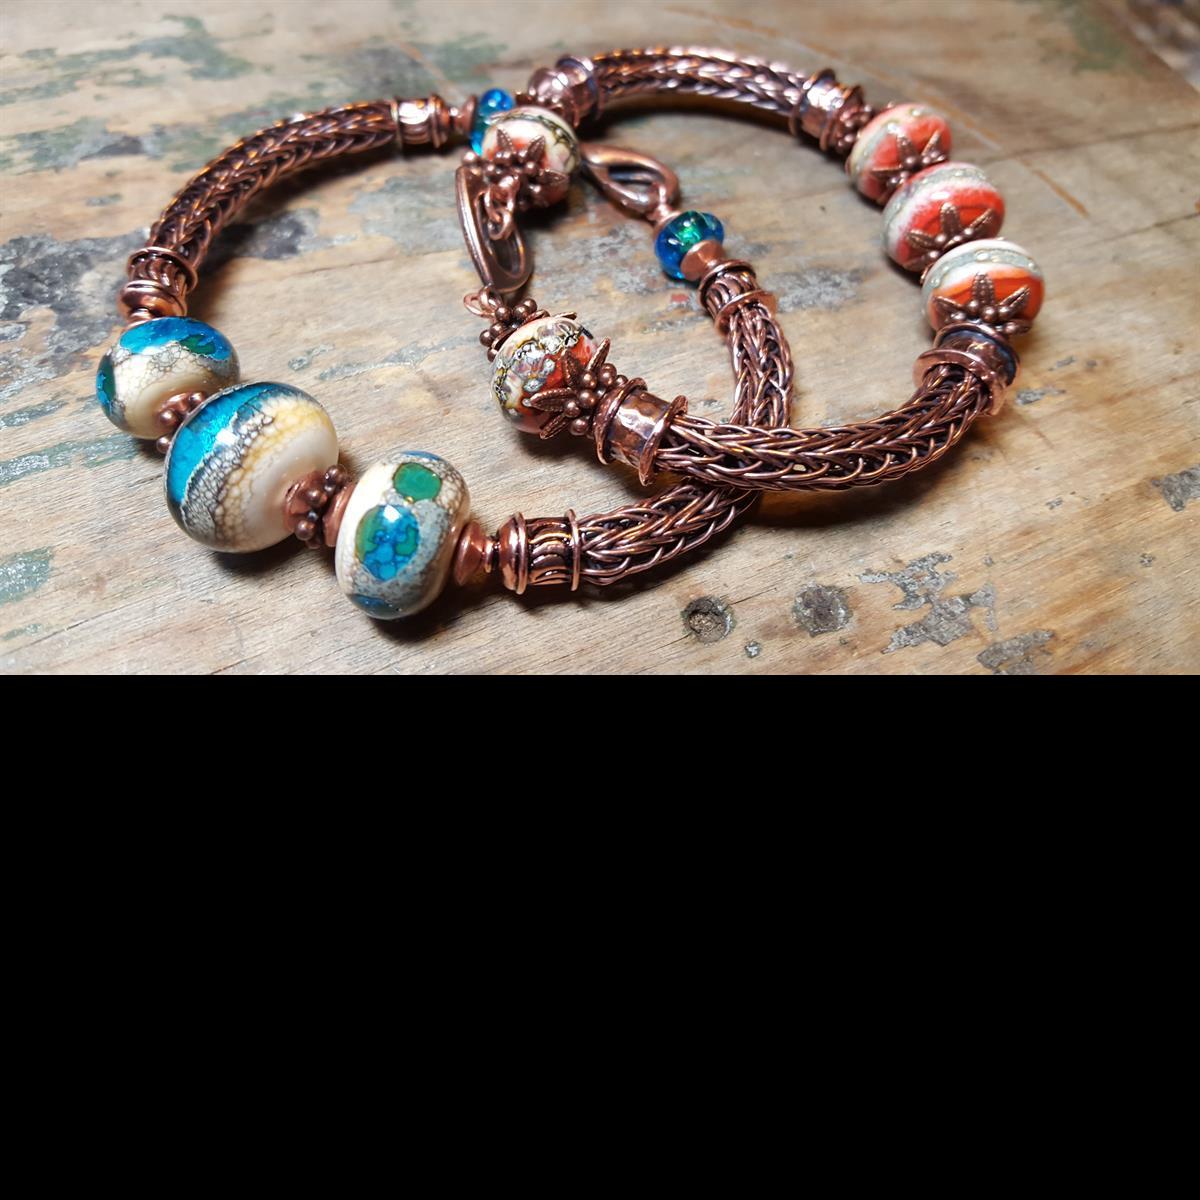 Double Viking Knit Bracelet